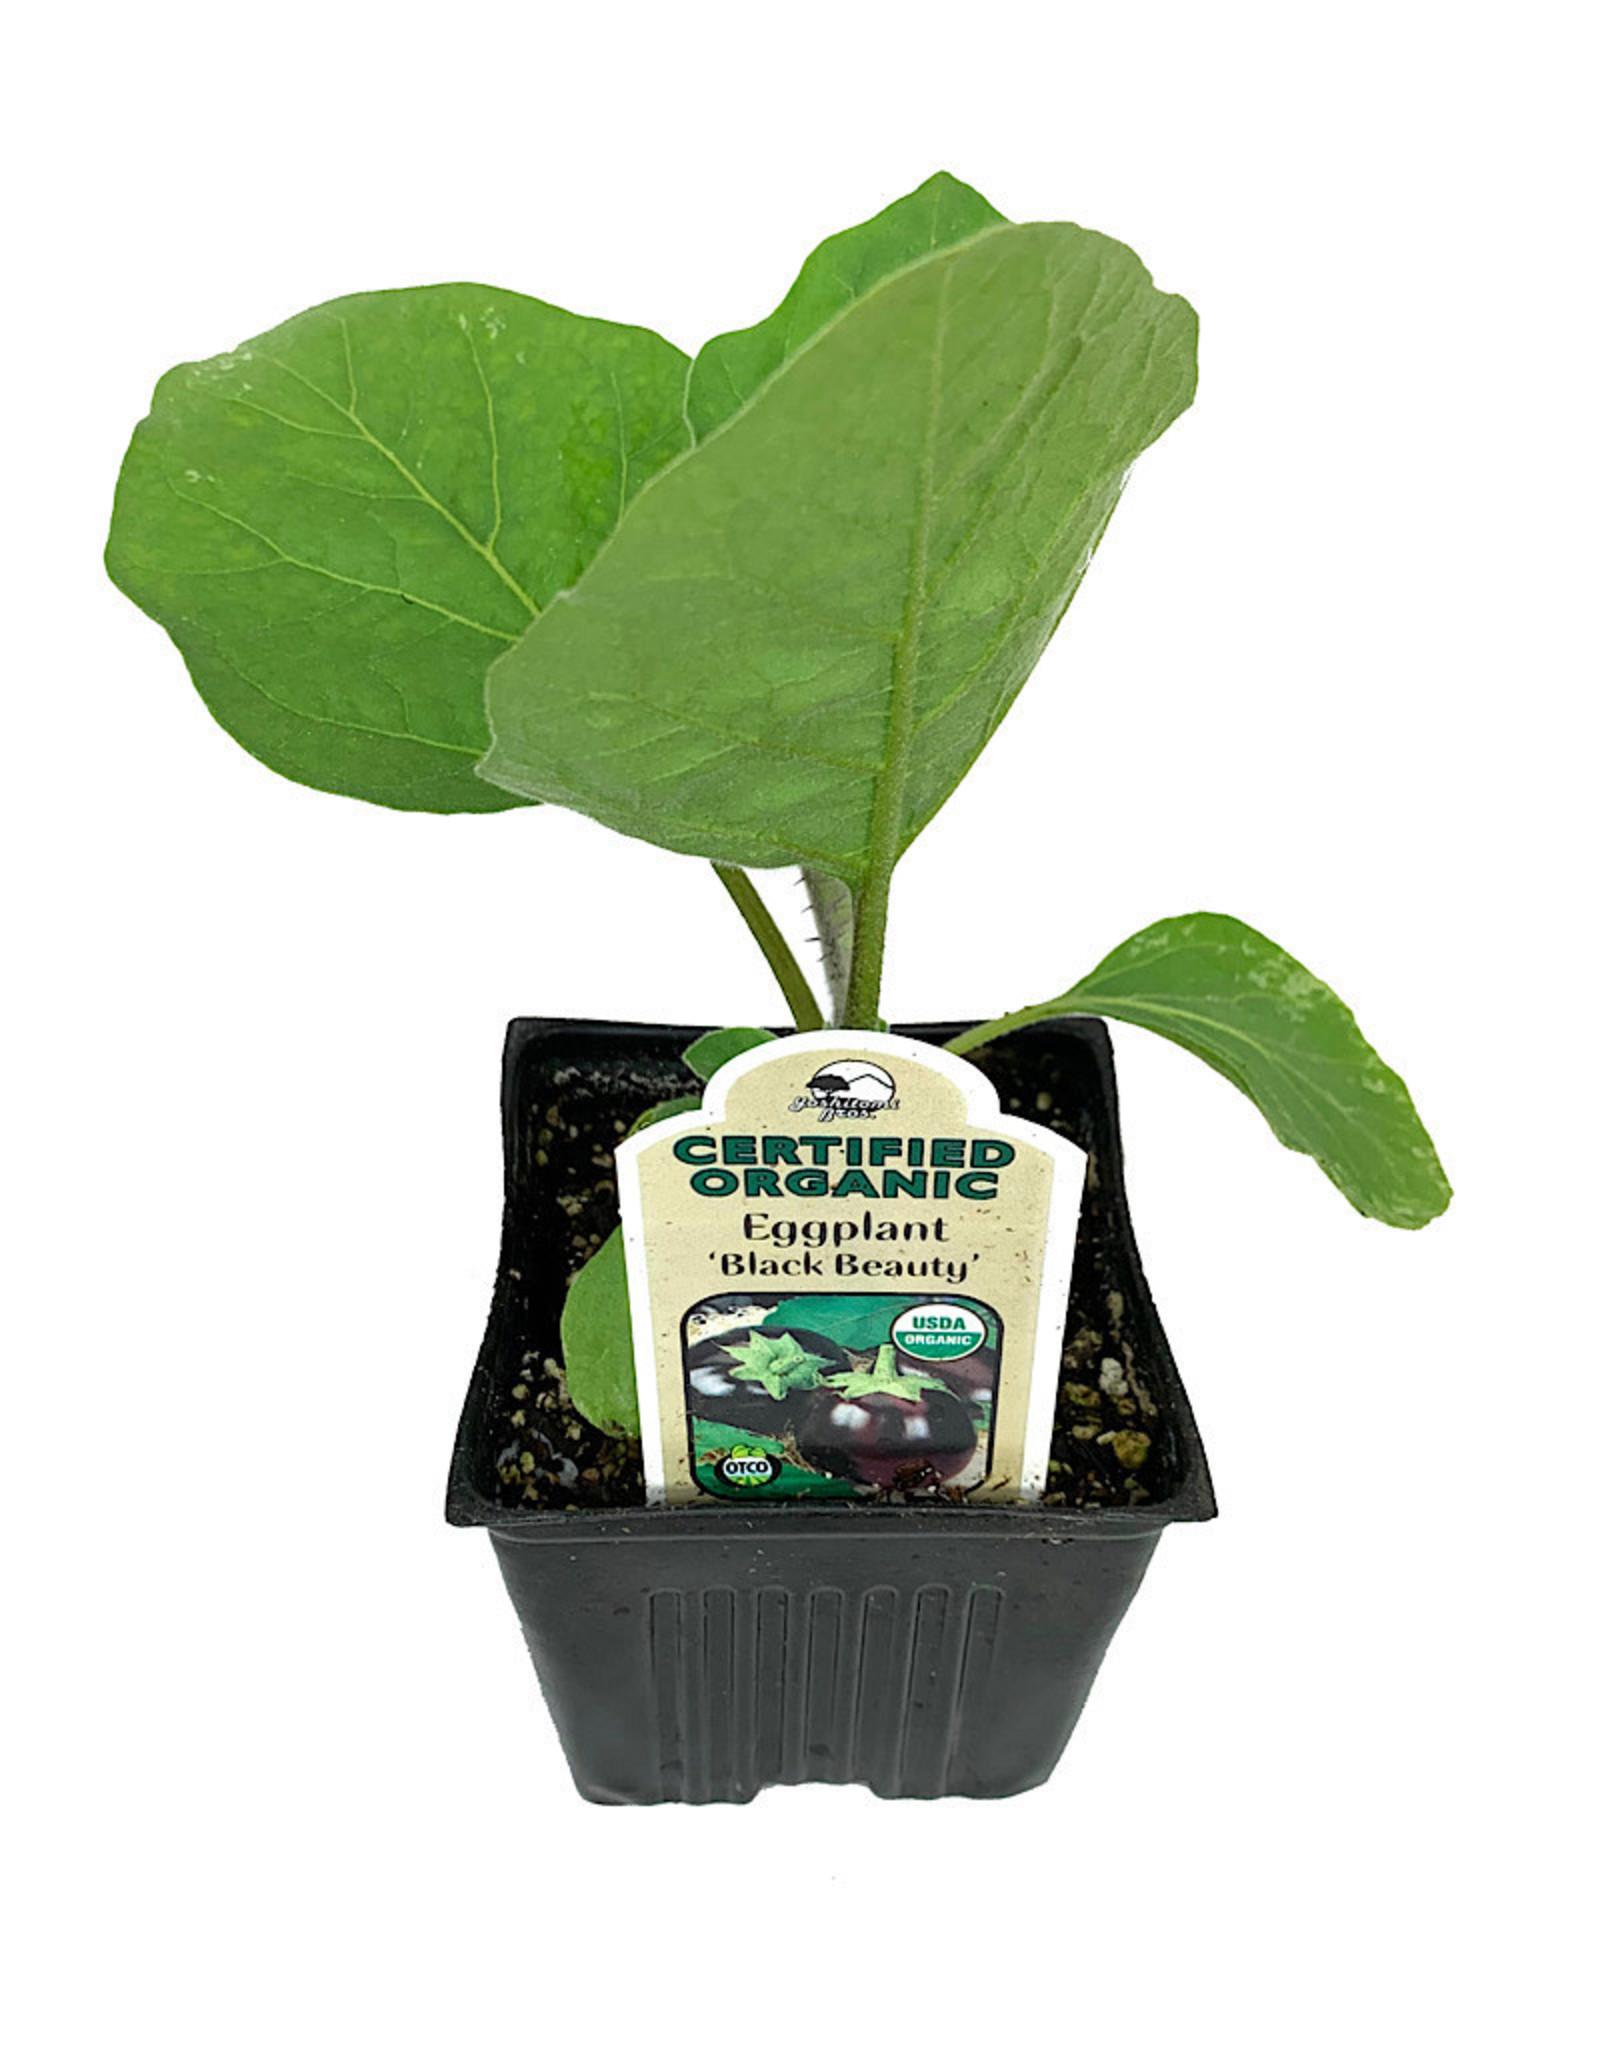 Eggplant 'Black Beauty' - 4 inch